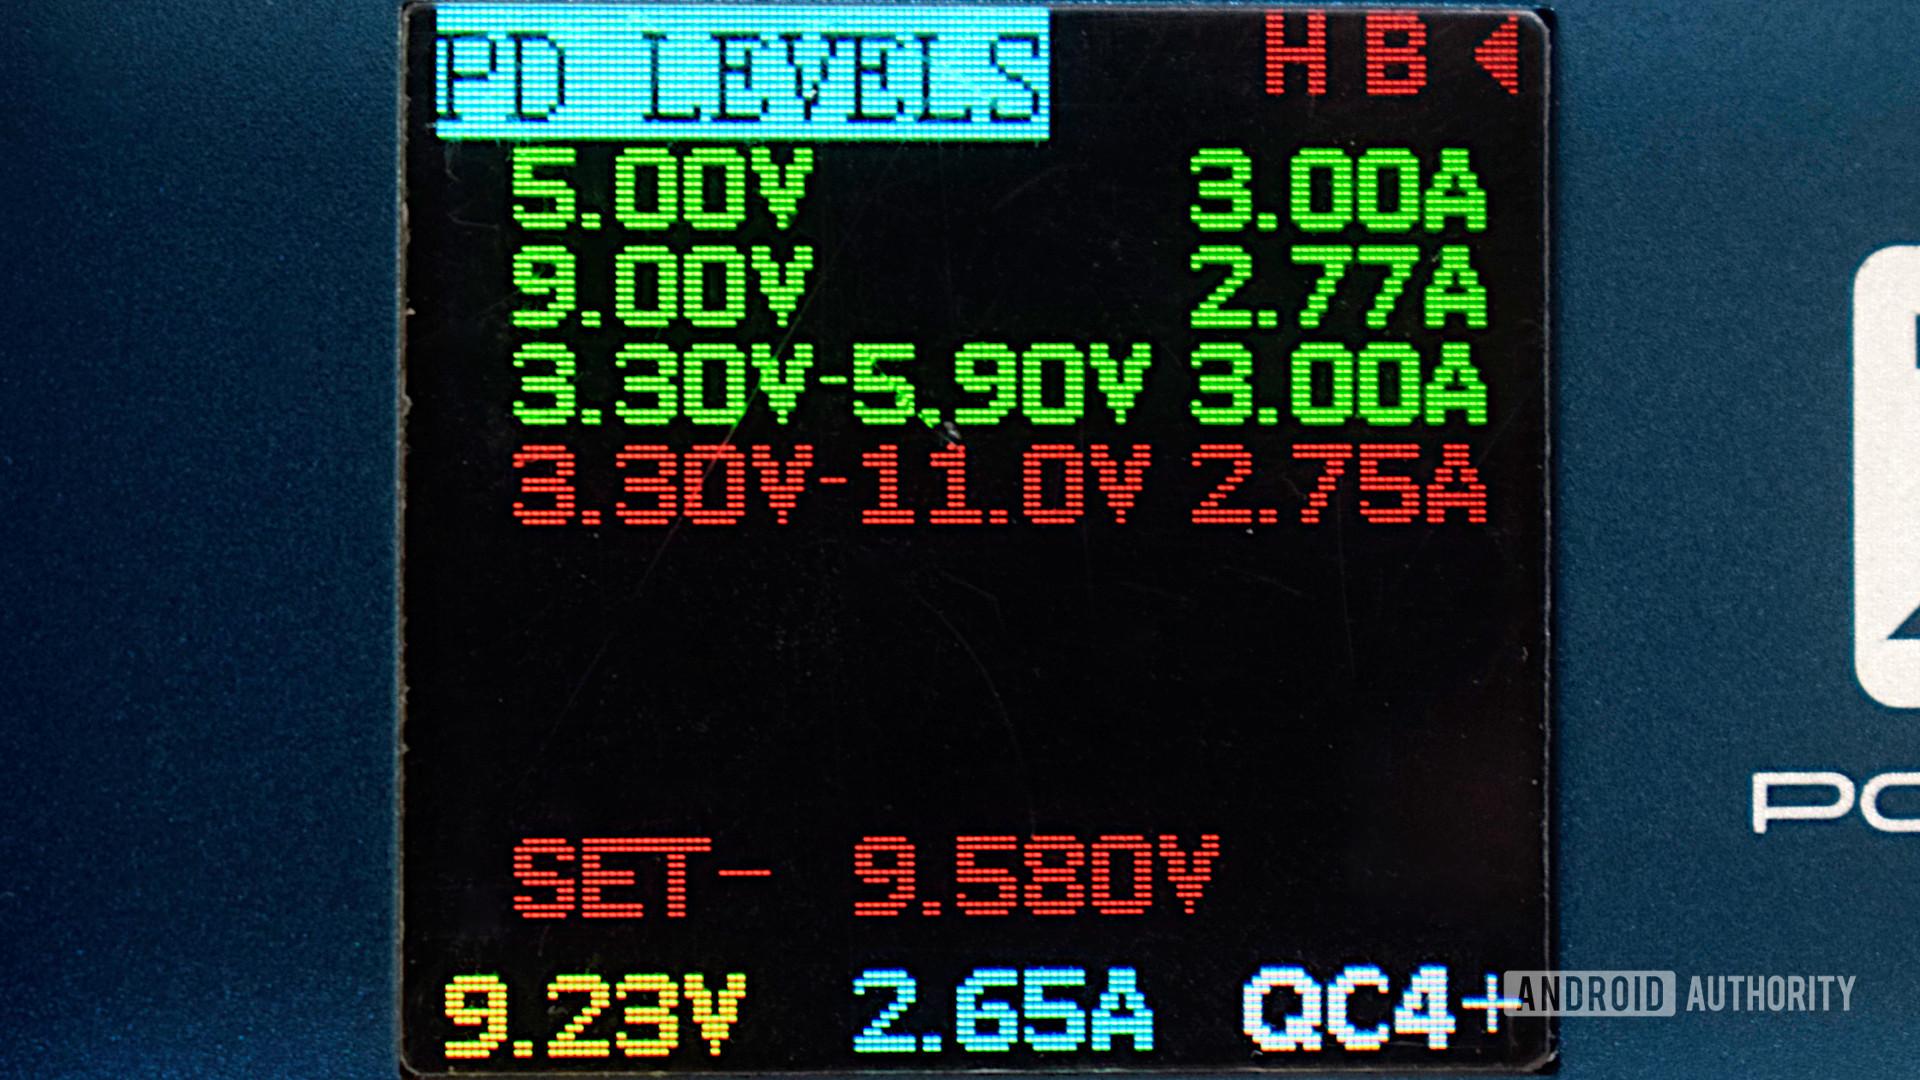 Samsung Galaxy 21 prefered power input